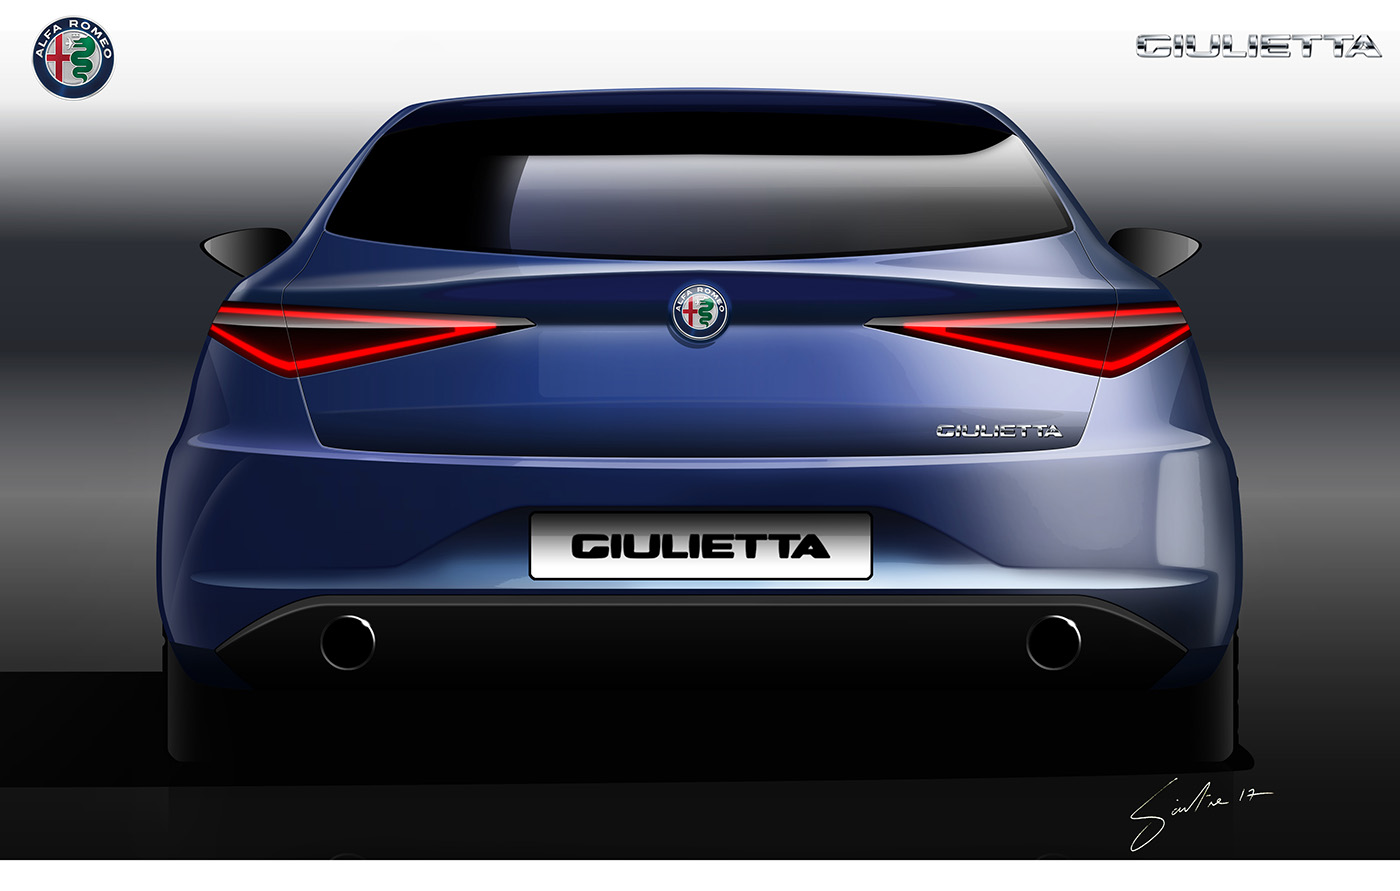 2018_Alfa_Romeo_Giulietta_rendering_02